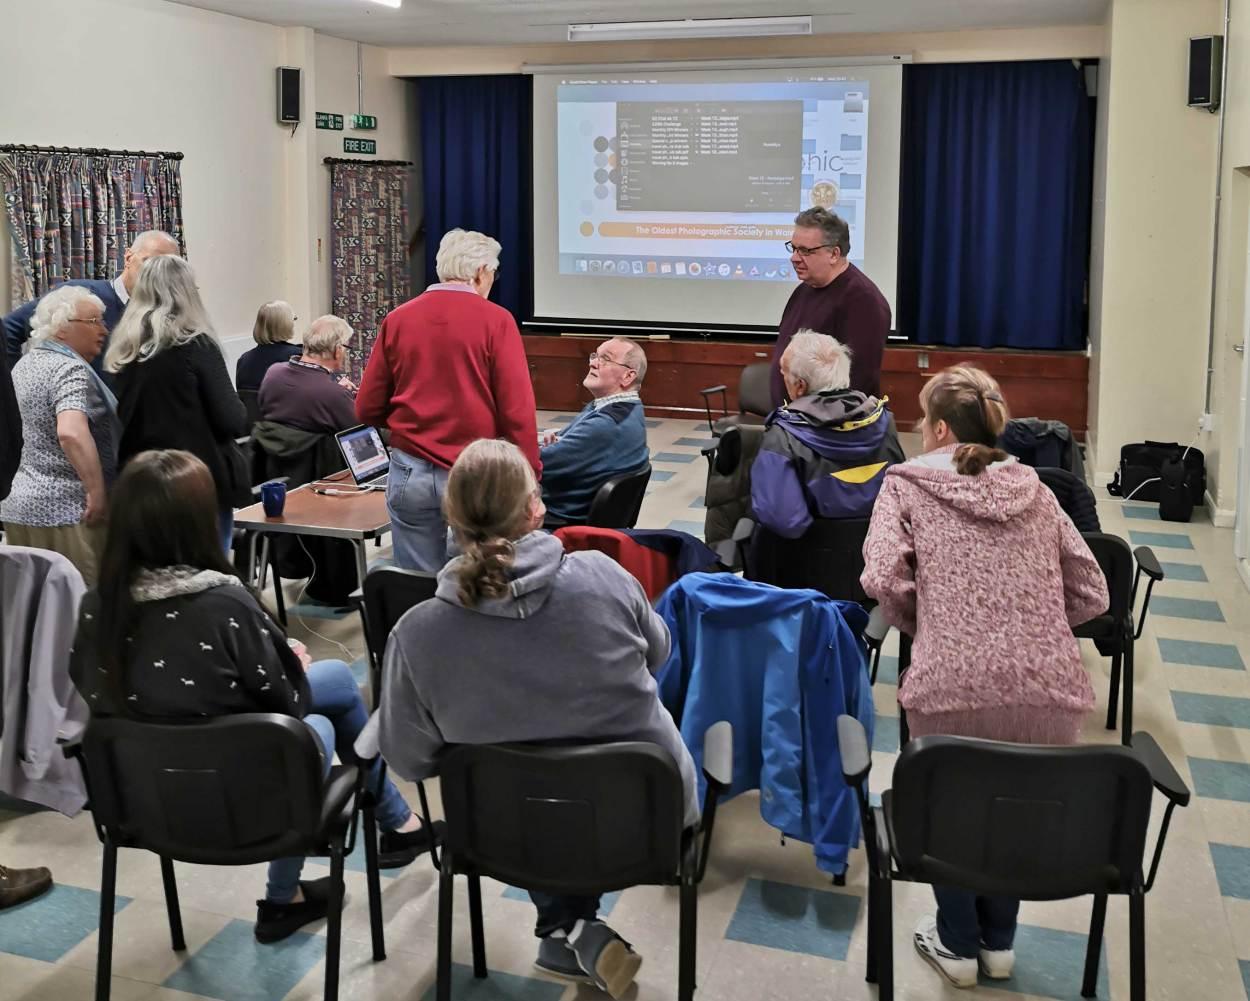 Camera club members gather in Llanelli